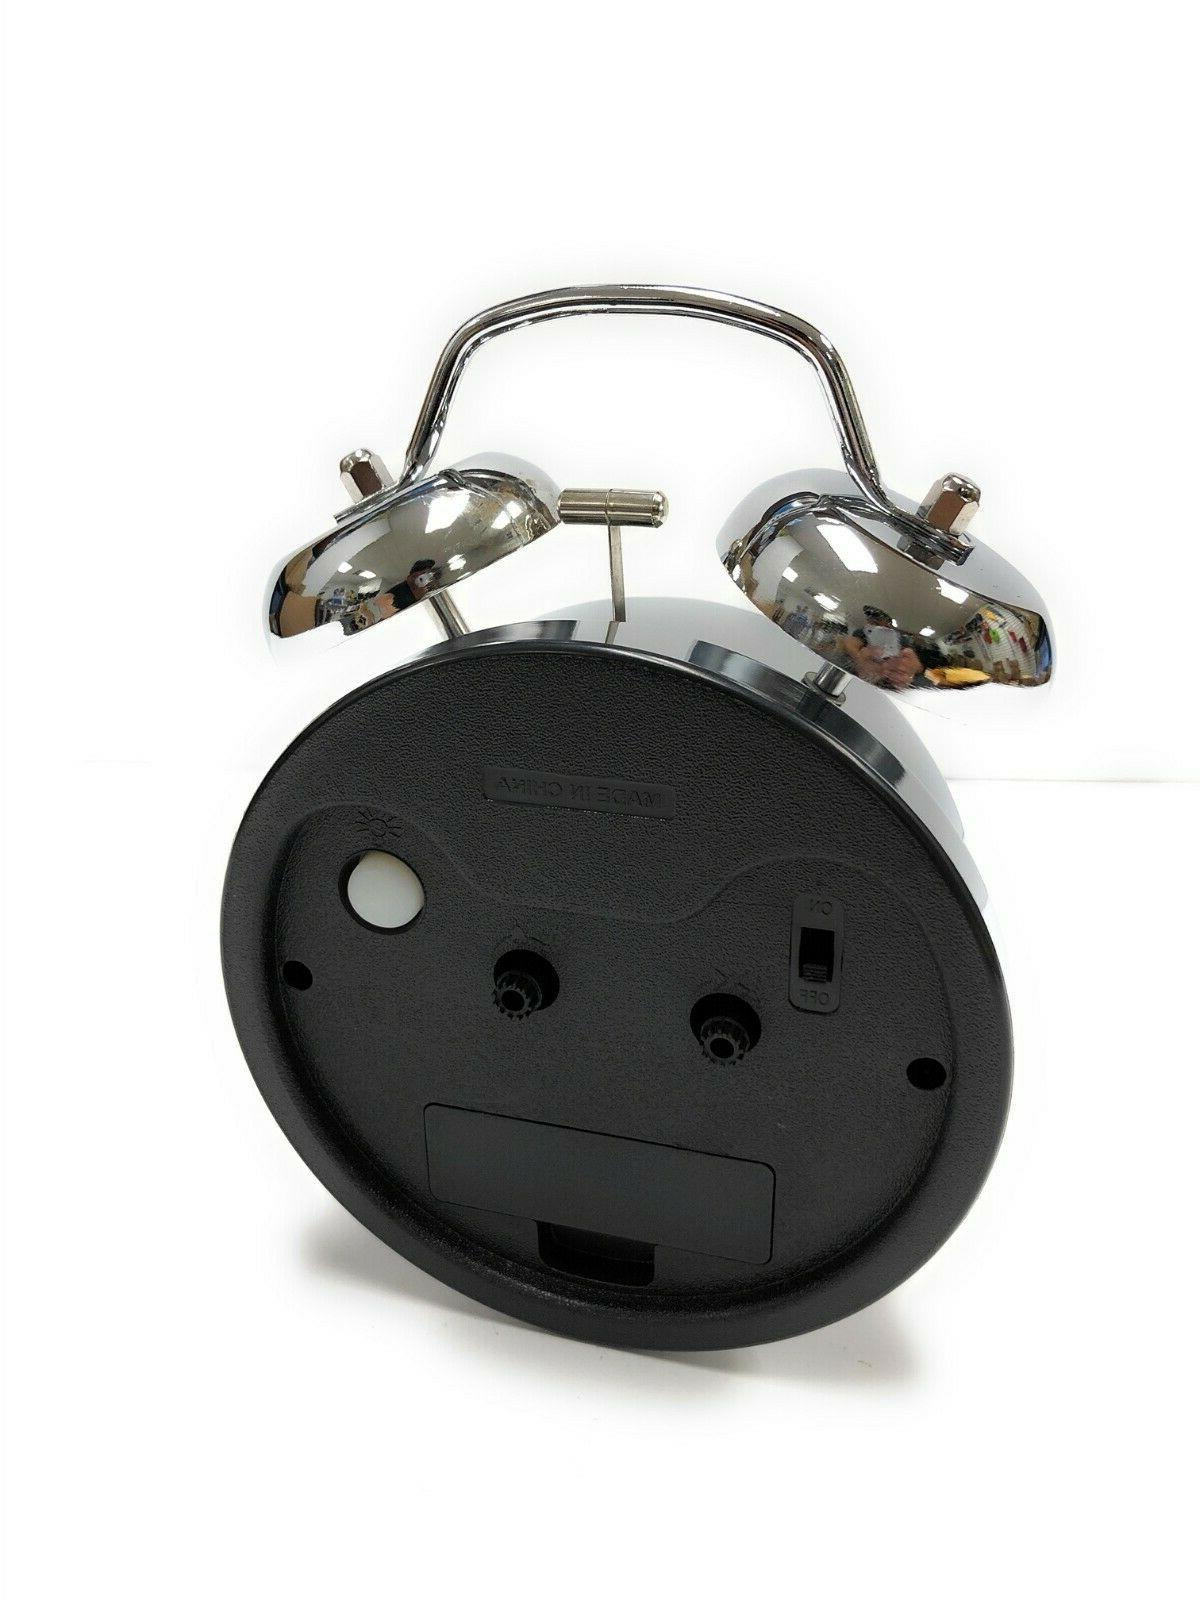 Classic Chrome Loud Analog Alarm Clock Twin Operated